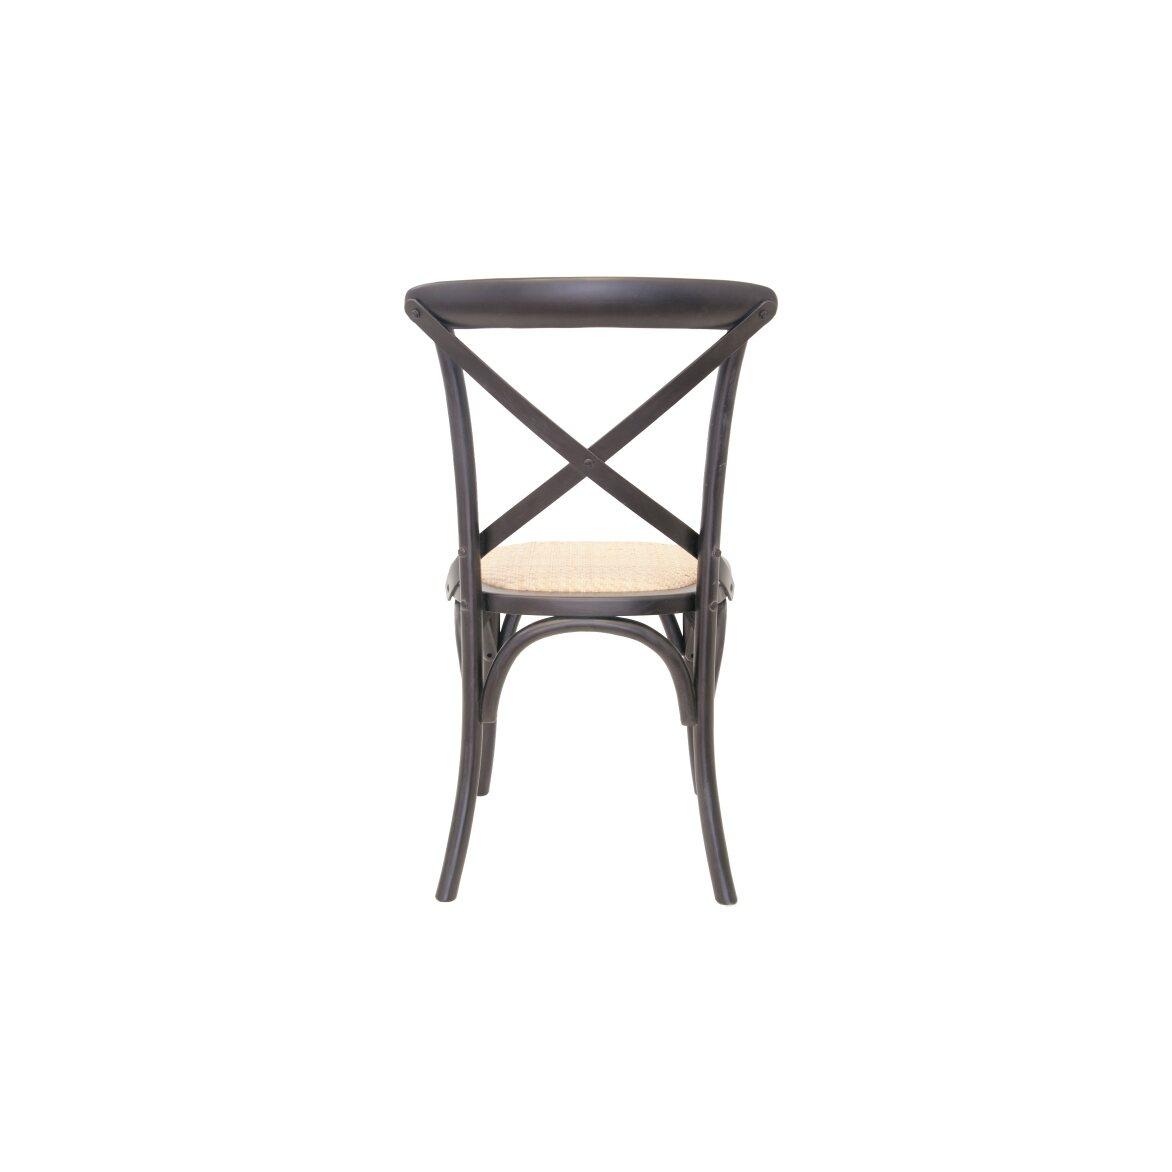 Стул Cross back black 3 | Обеденные стулья Kingsby